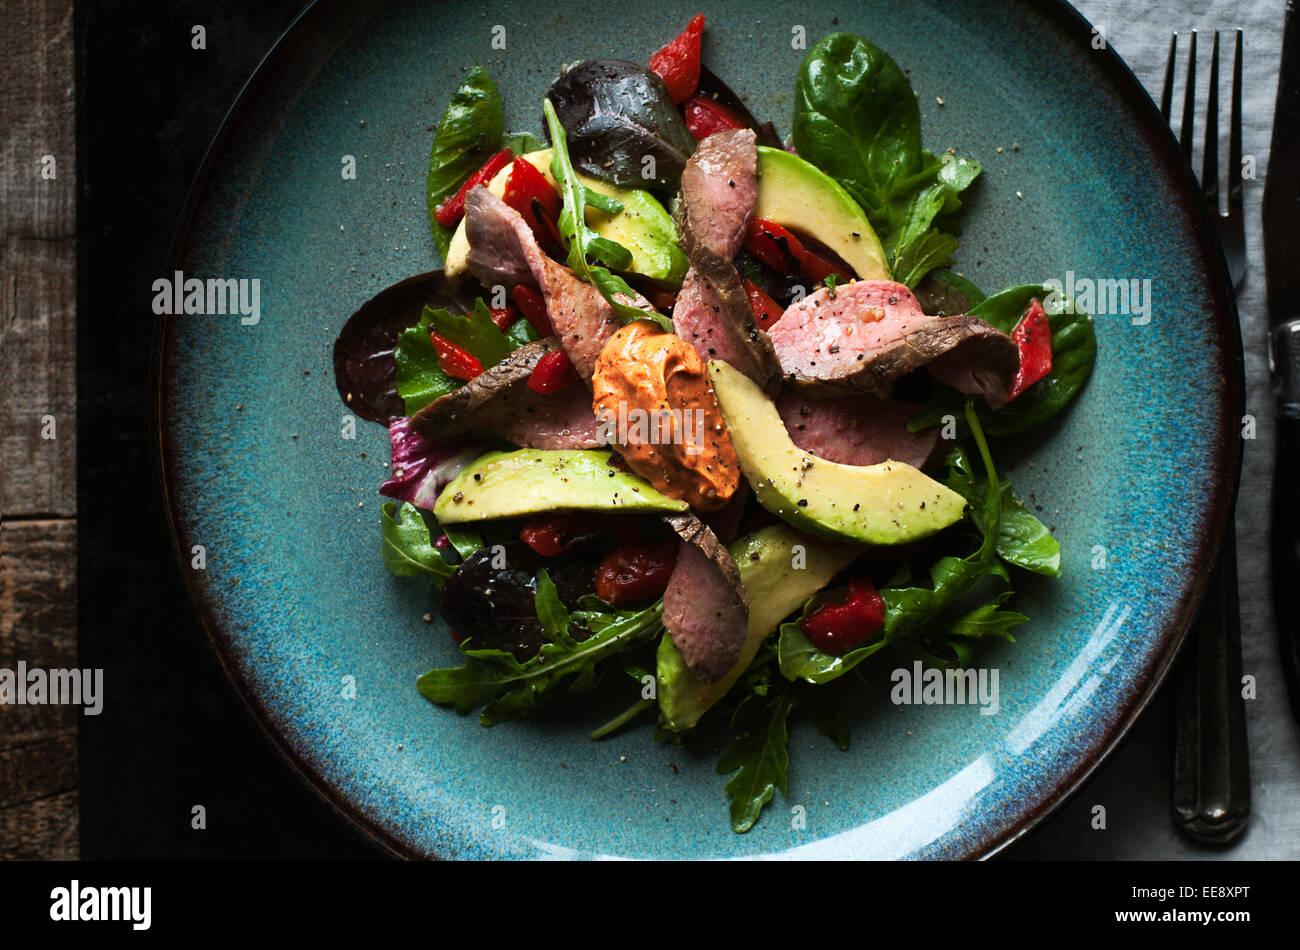 Gemischter Salat mit Roastbeef und geräucherter Paprika aioli Stockfoto